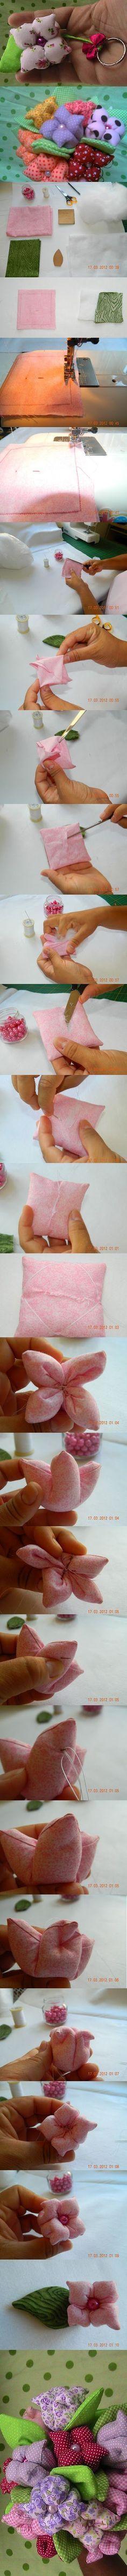 HONEY BOUQUETS: fabric tulips